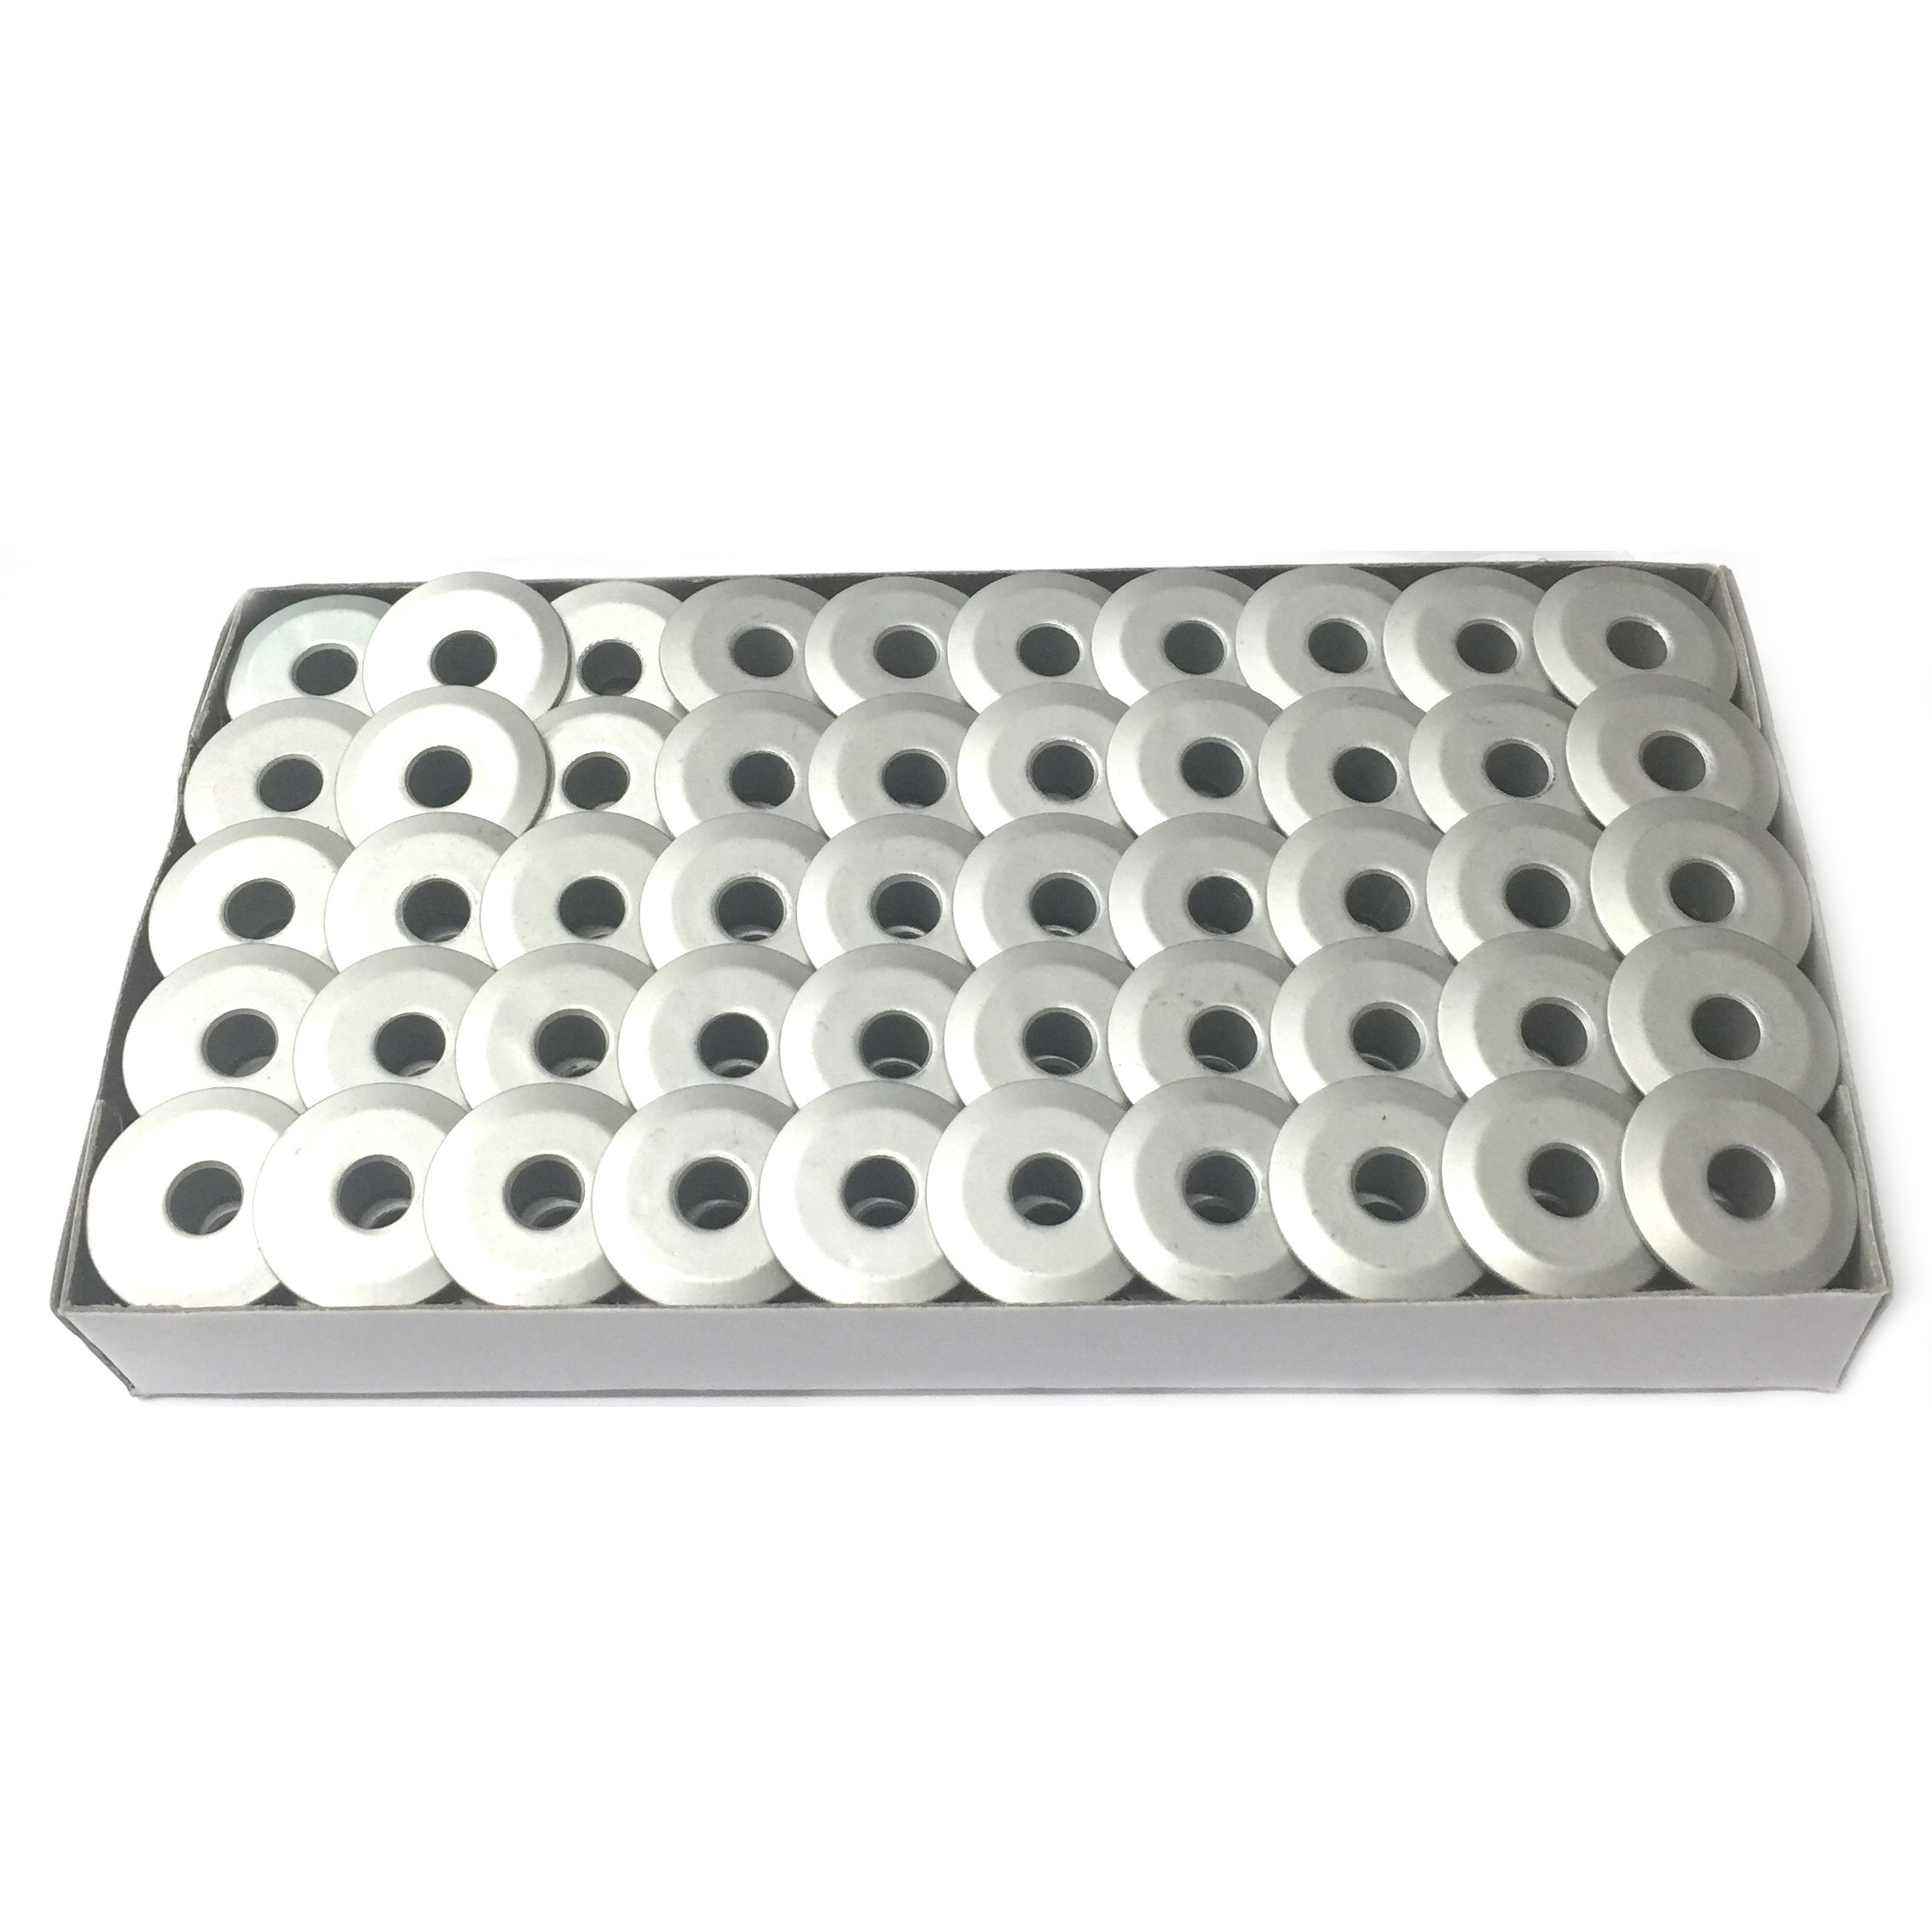 Cutex Brand 100 Aluminum M Size Bobbins for TIN Lizzie 18 Quilting Machines by Cutex Sewing Supplies